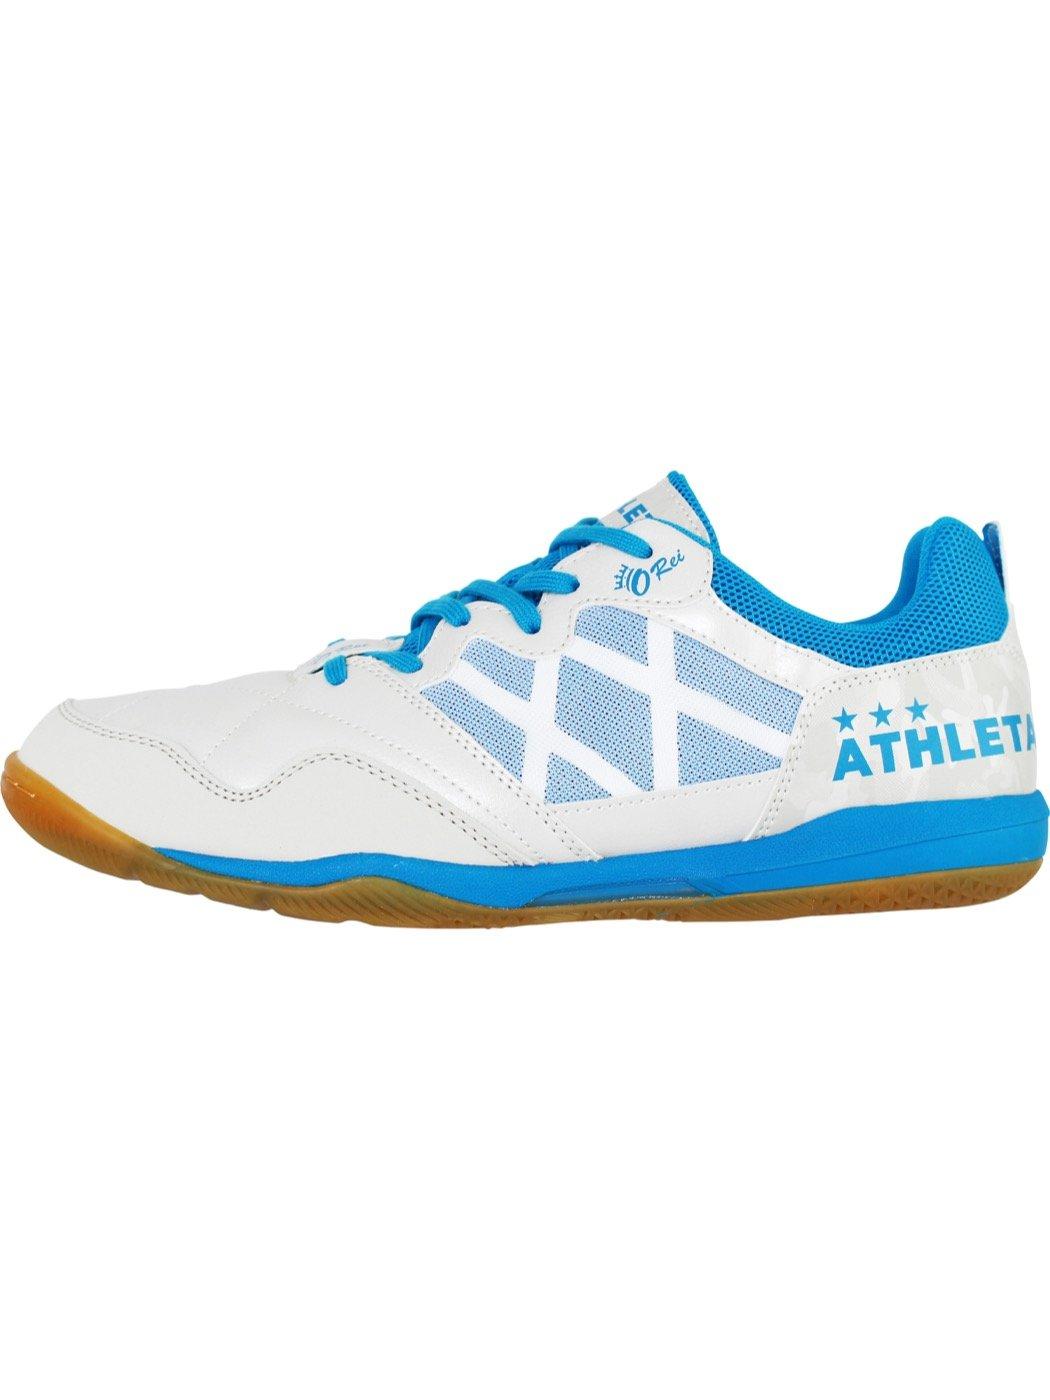 ATHLETA(アスレタ) O-Rei Futsal T002 11005-PW B06XZZ3DQM 27|1849 1849 27